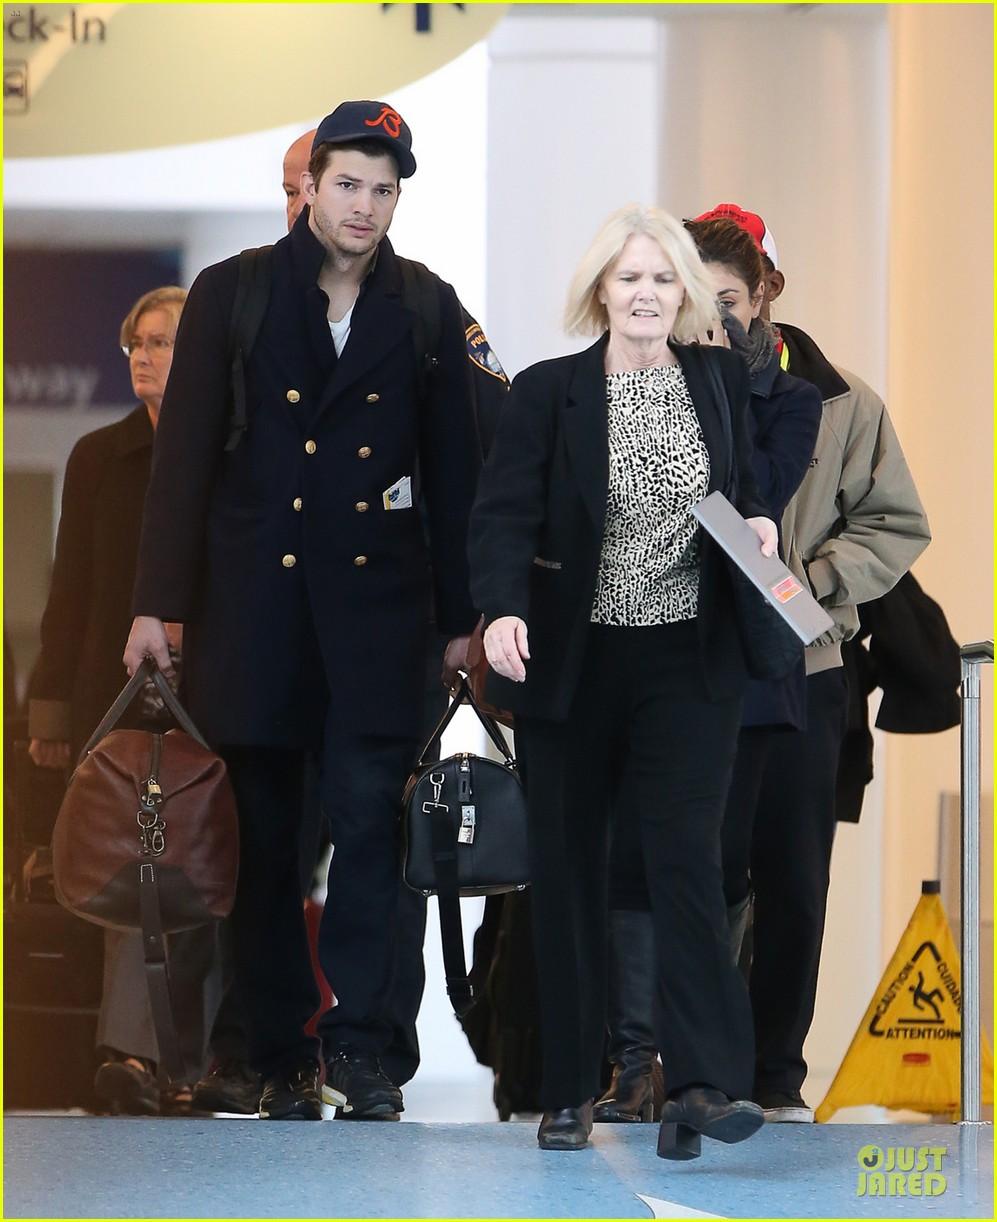 ashton kutcher mila kunis jacksonville airport departing couple 063046419